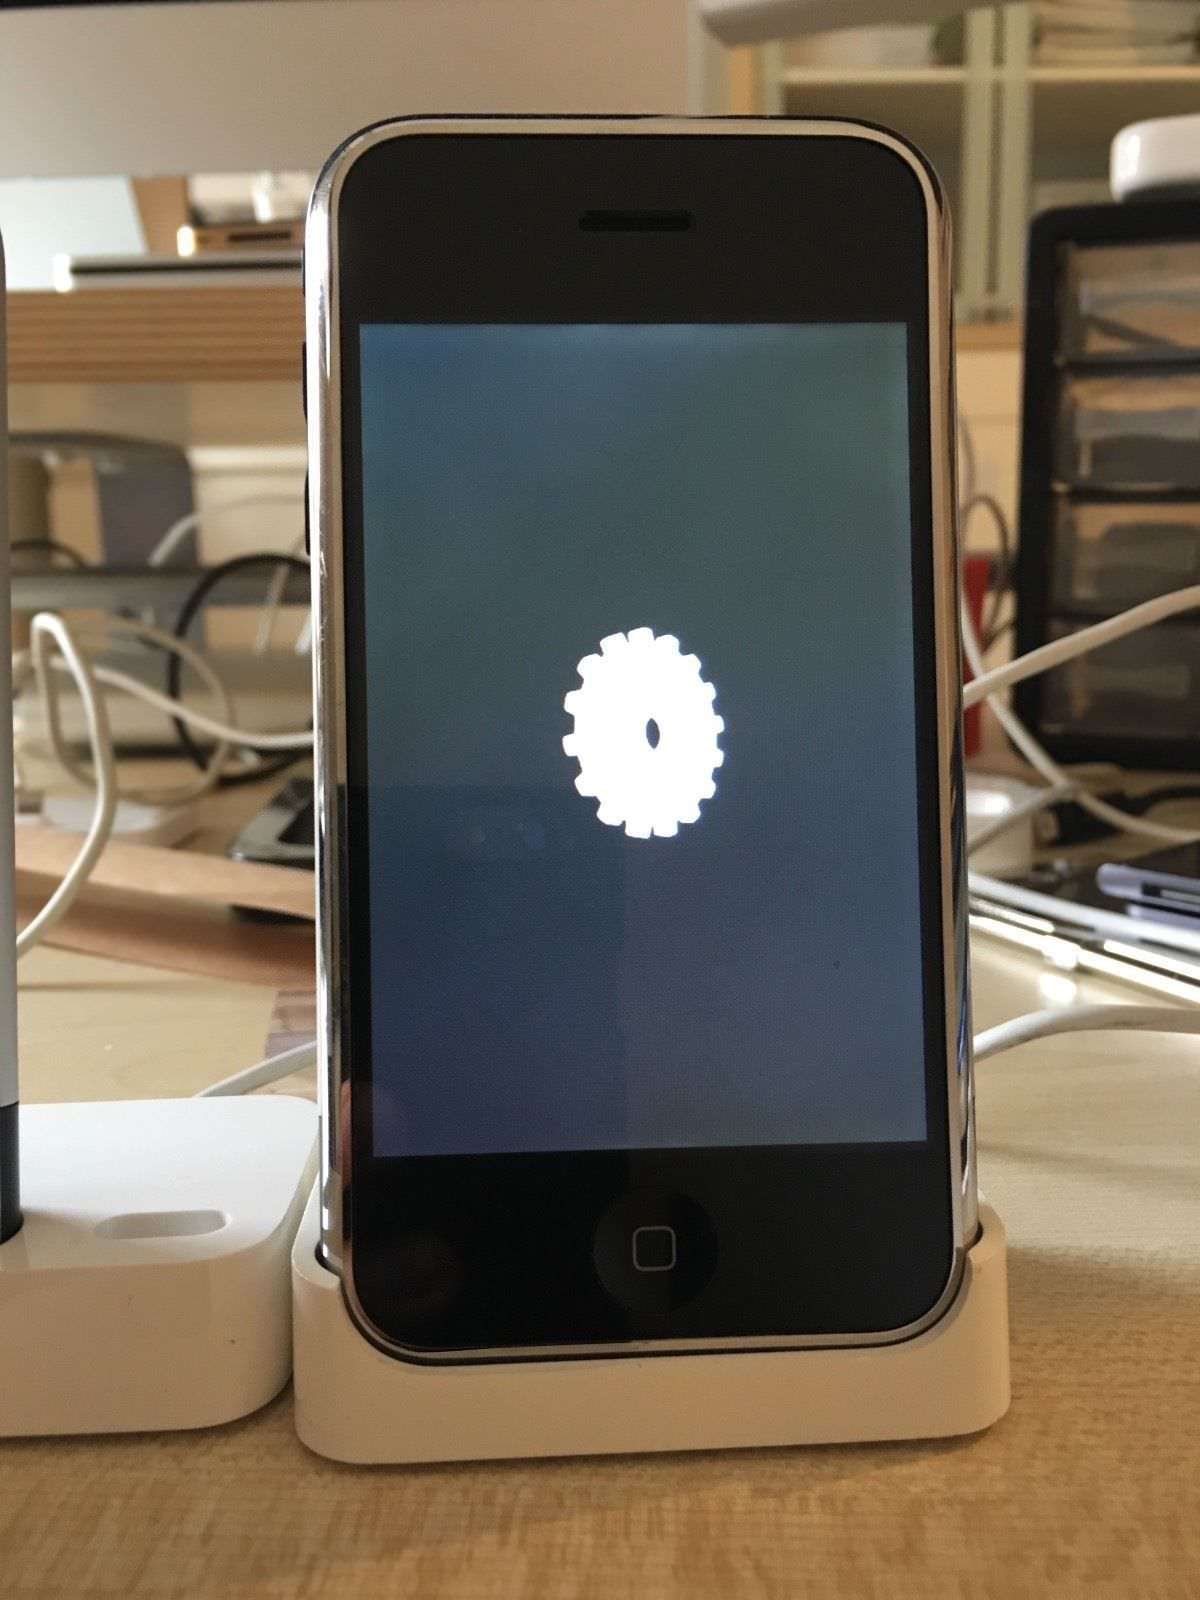 Prototype-Original-iPhone-on-ebay-5.jpg